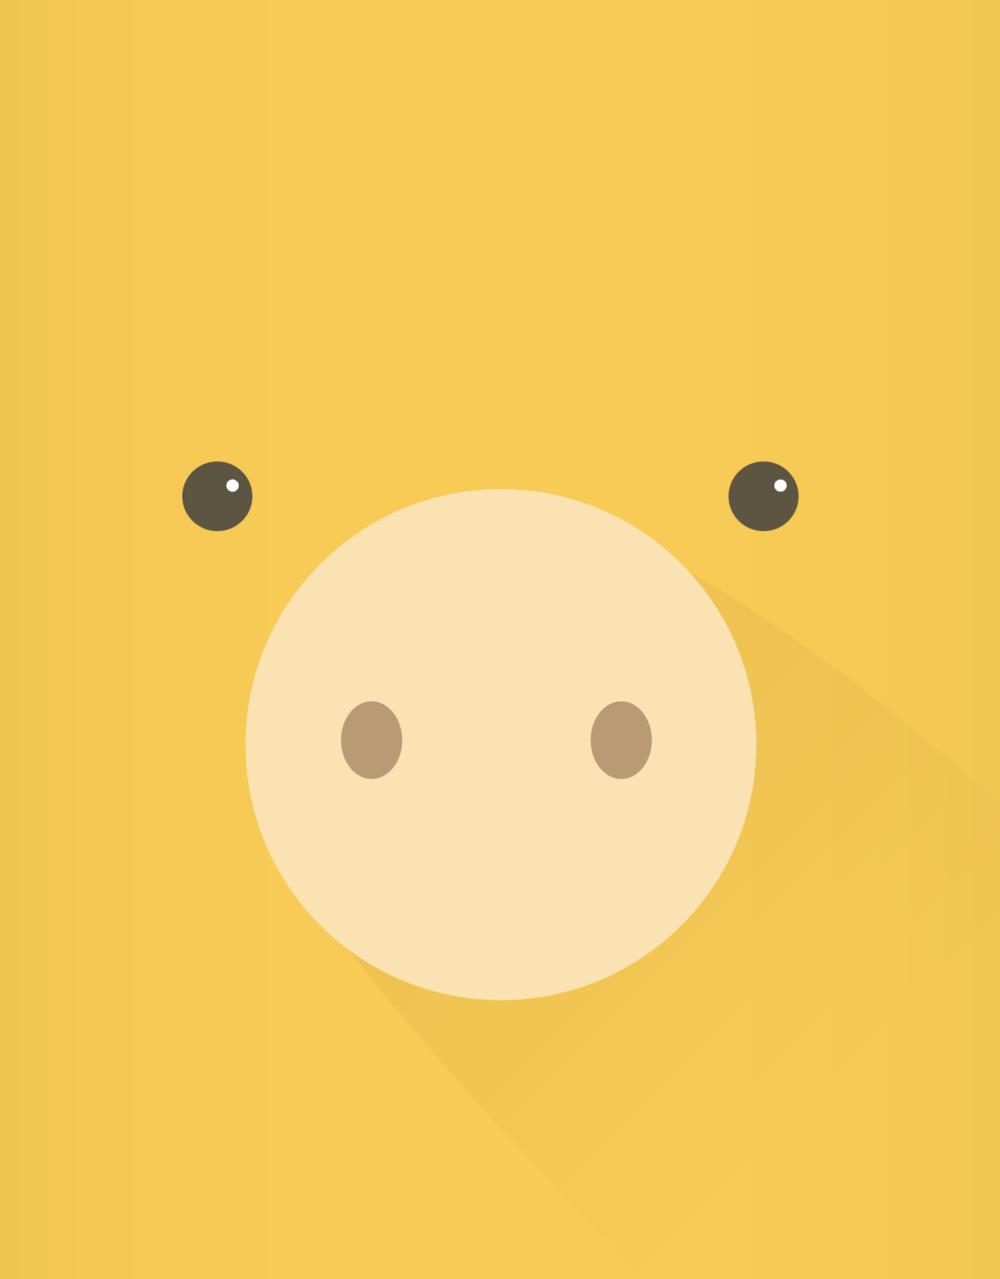 EQBank-piggy.png